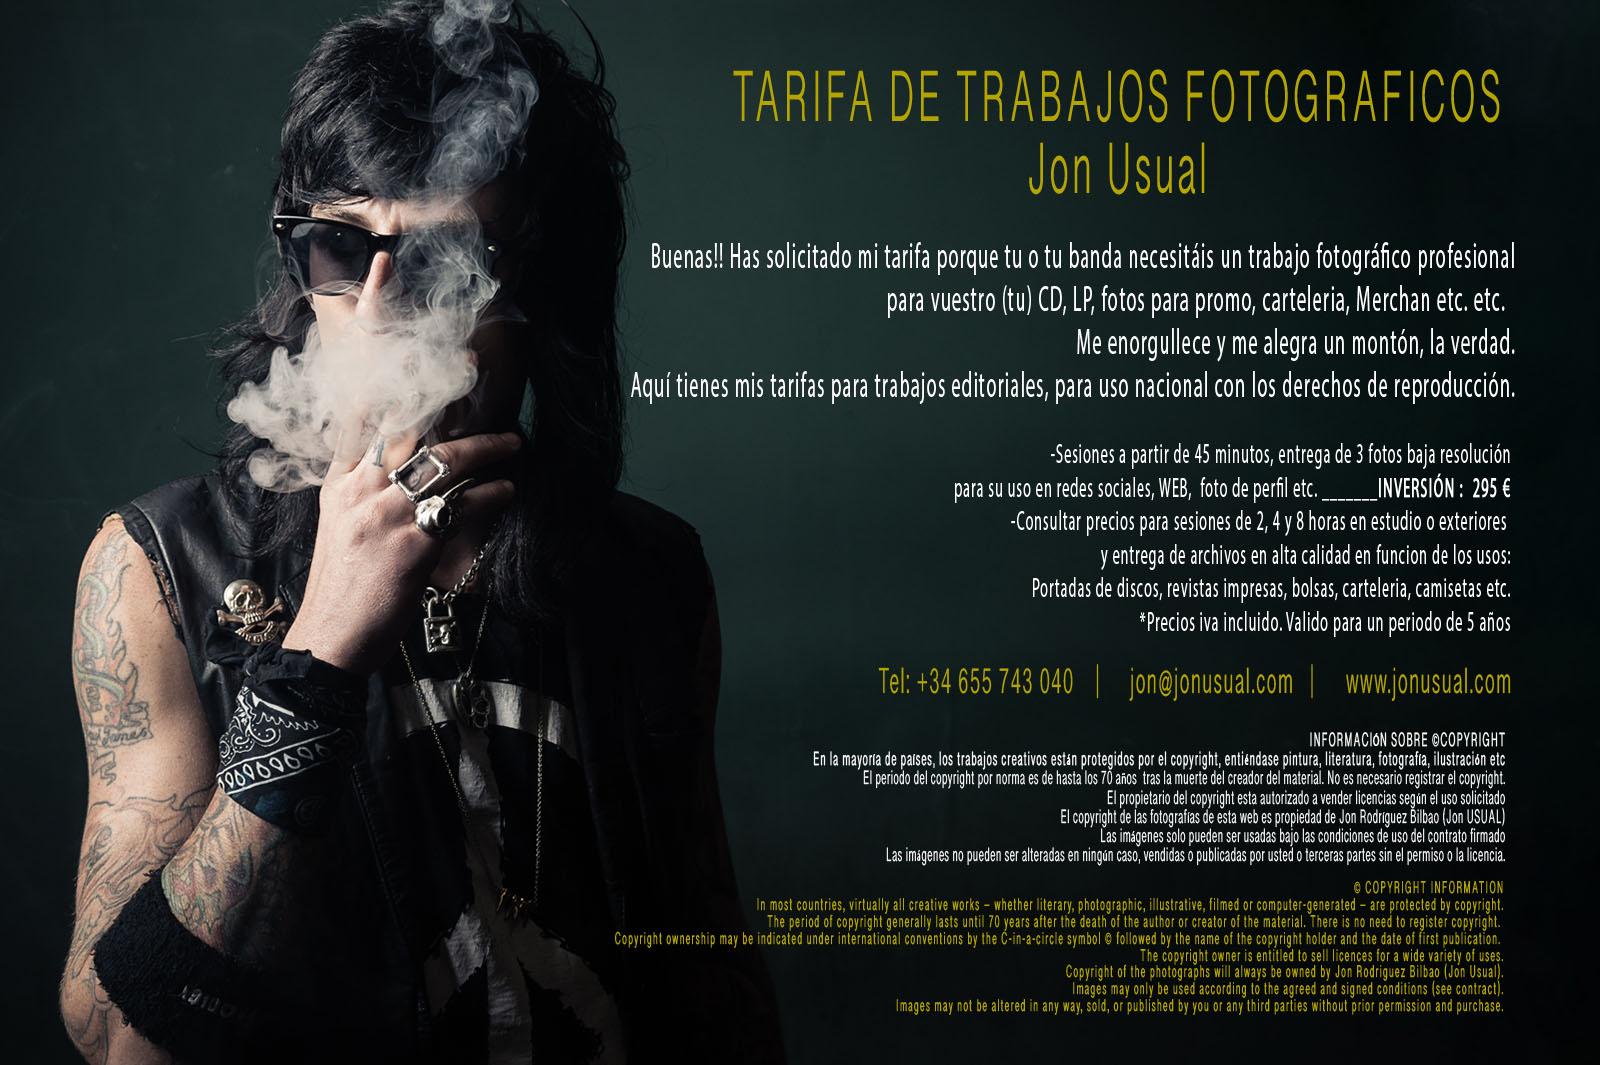 Retratos bilbao, fotografo Bilbao, retrato corporativo, fotografo de rock